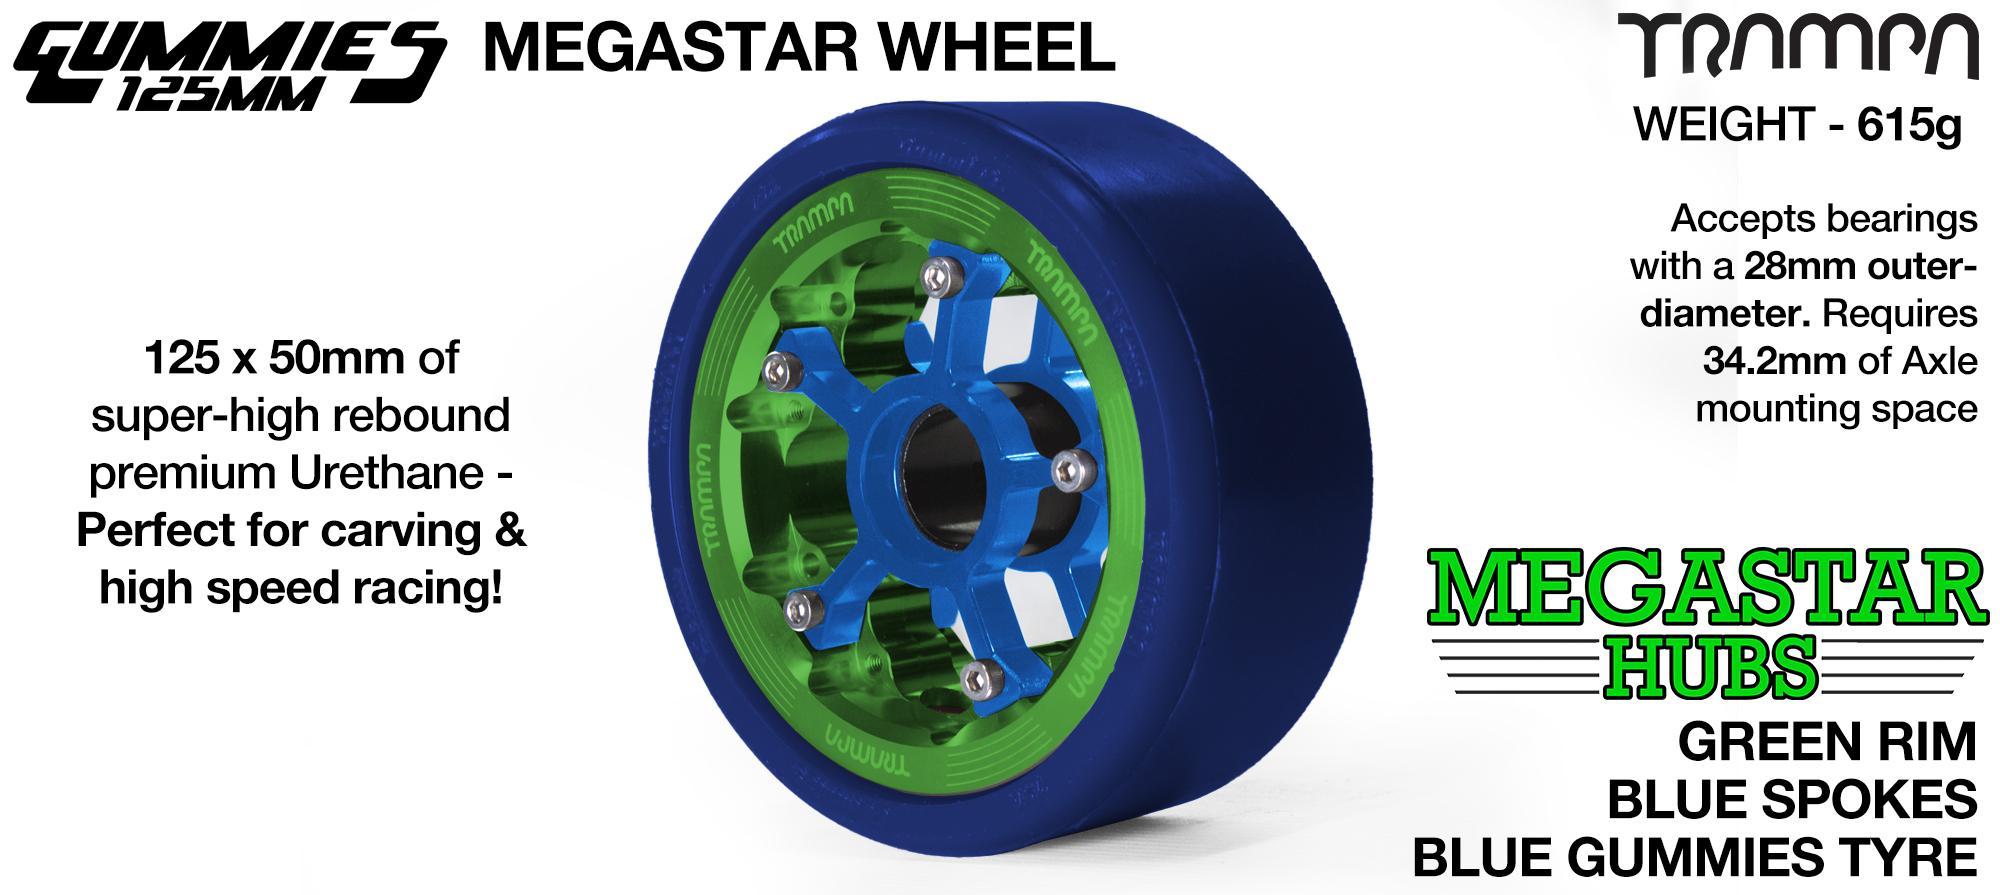 GREEN MEGASTAR Rim with BLUE Spokes with BLUE Gummies - The Ulrimate Longboard Wheel